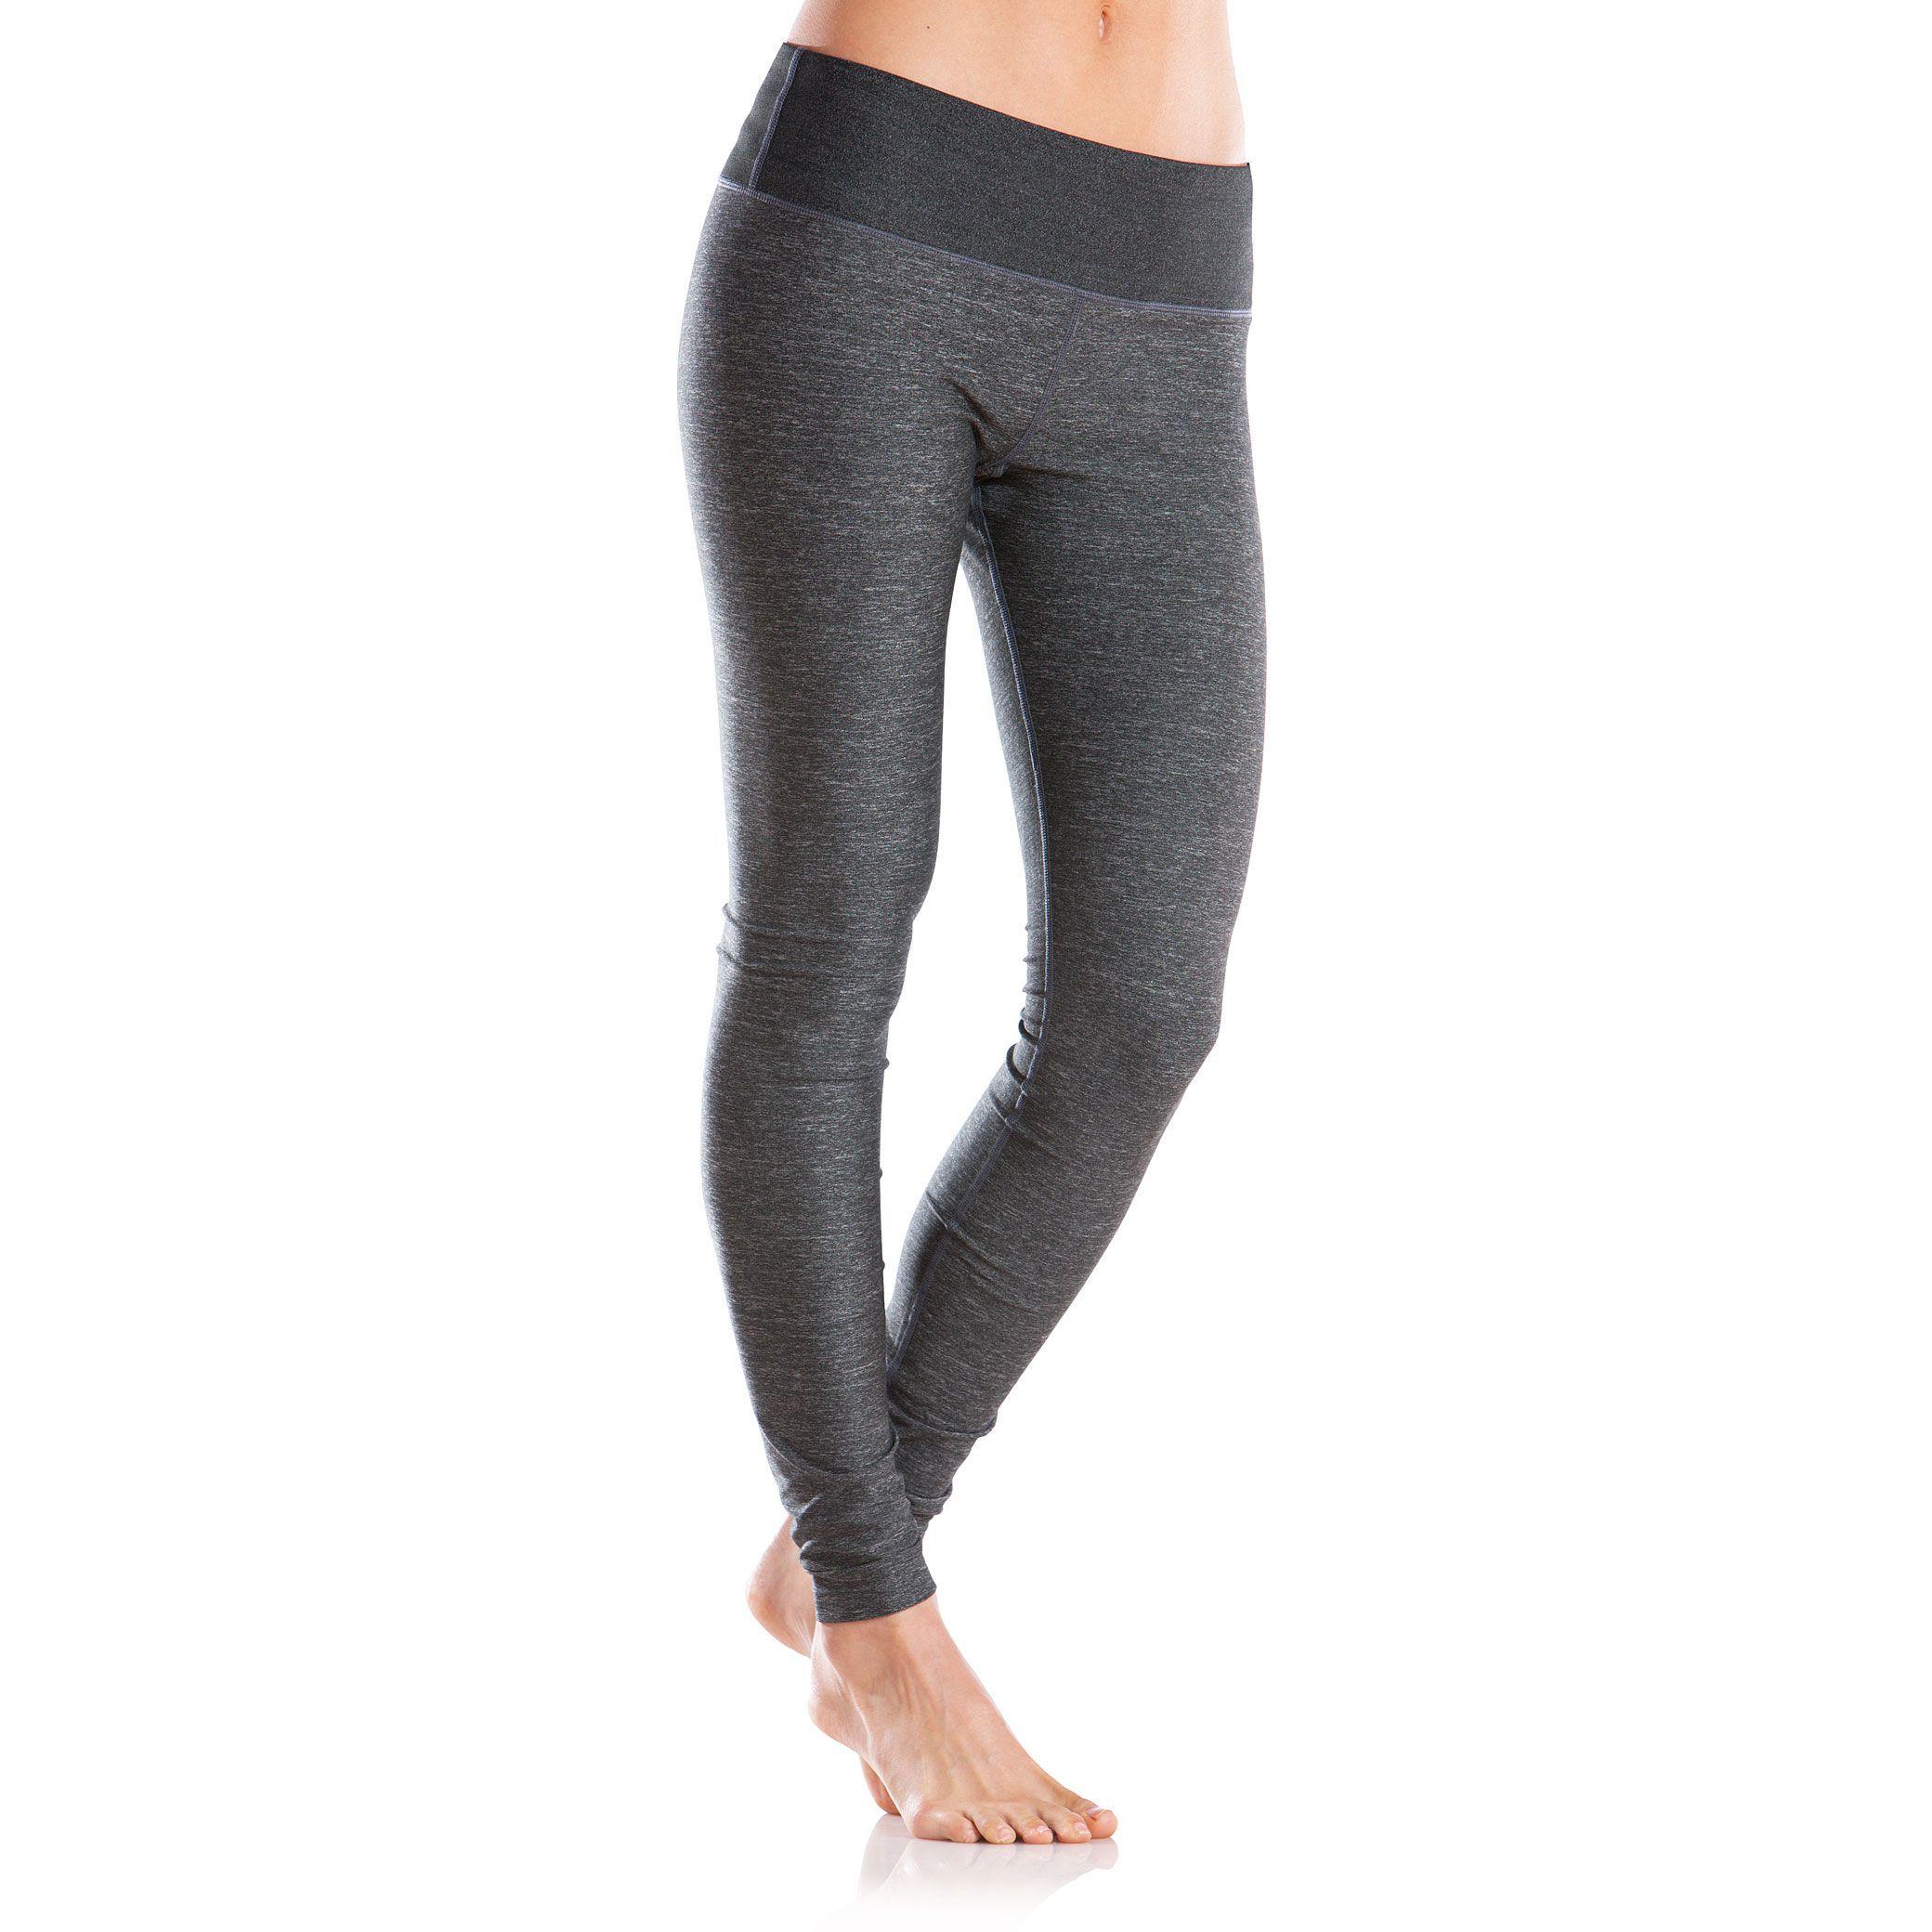 pants fitness comforter pinterest gear run pin endurance moving comfort tight